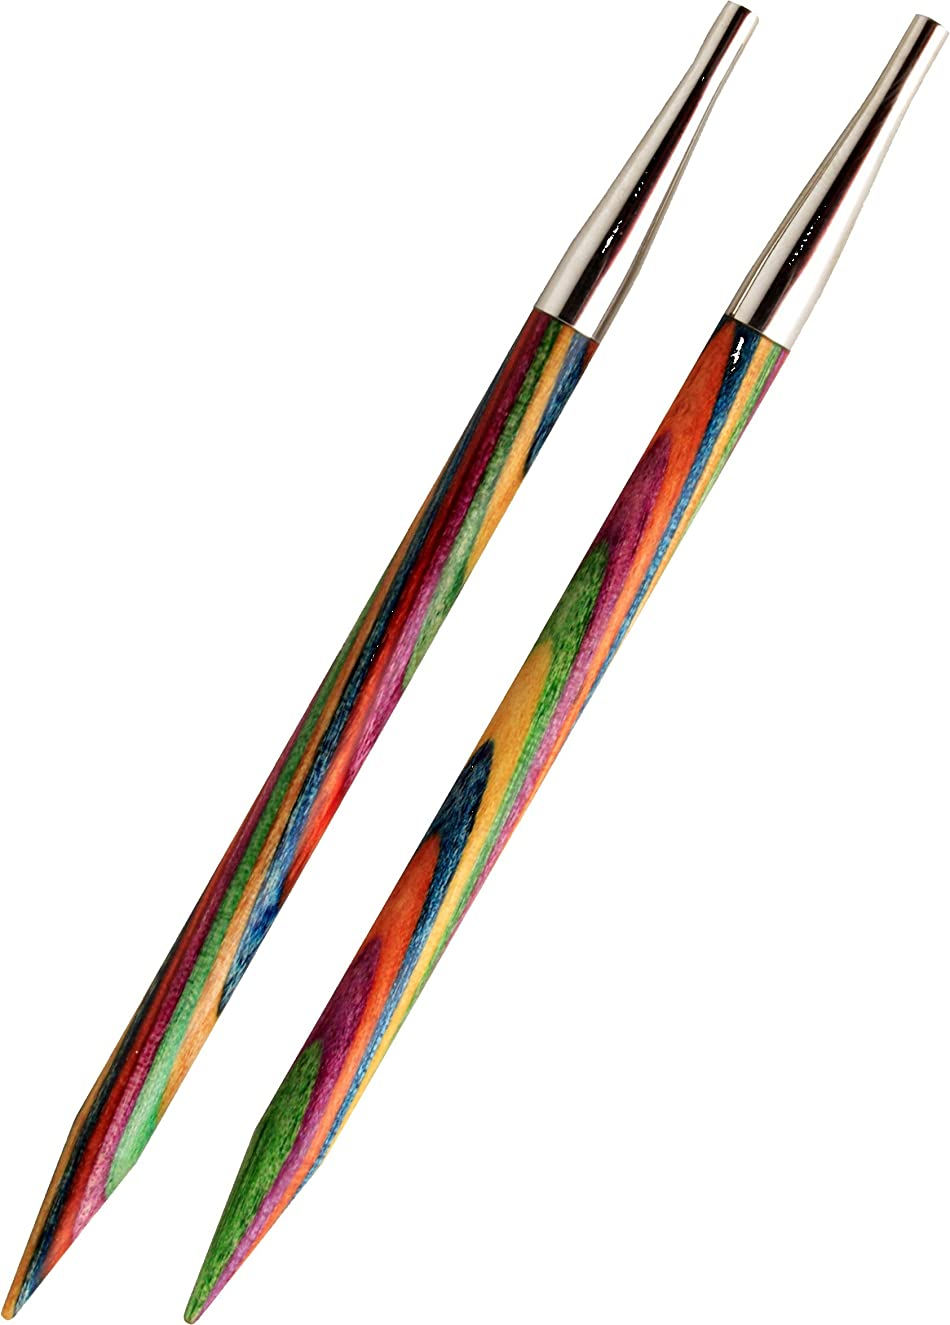 Knit Pro Symfonie Wood Interchangeable Point Knitting Needles - 11.50cm (Pair) - 7.00mm Knitting Needles